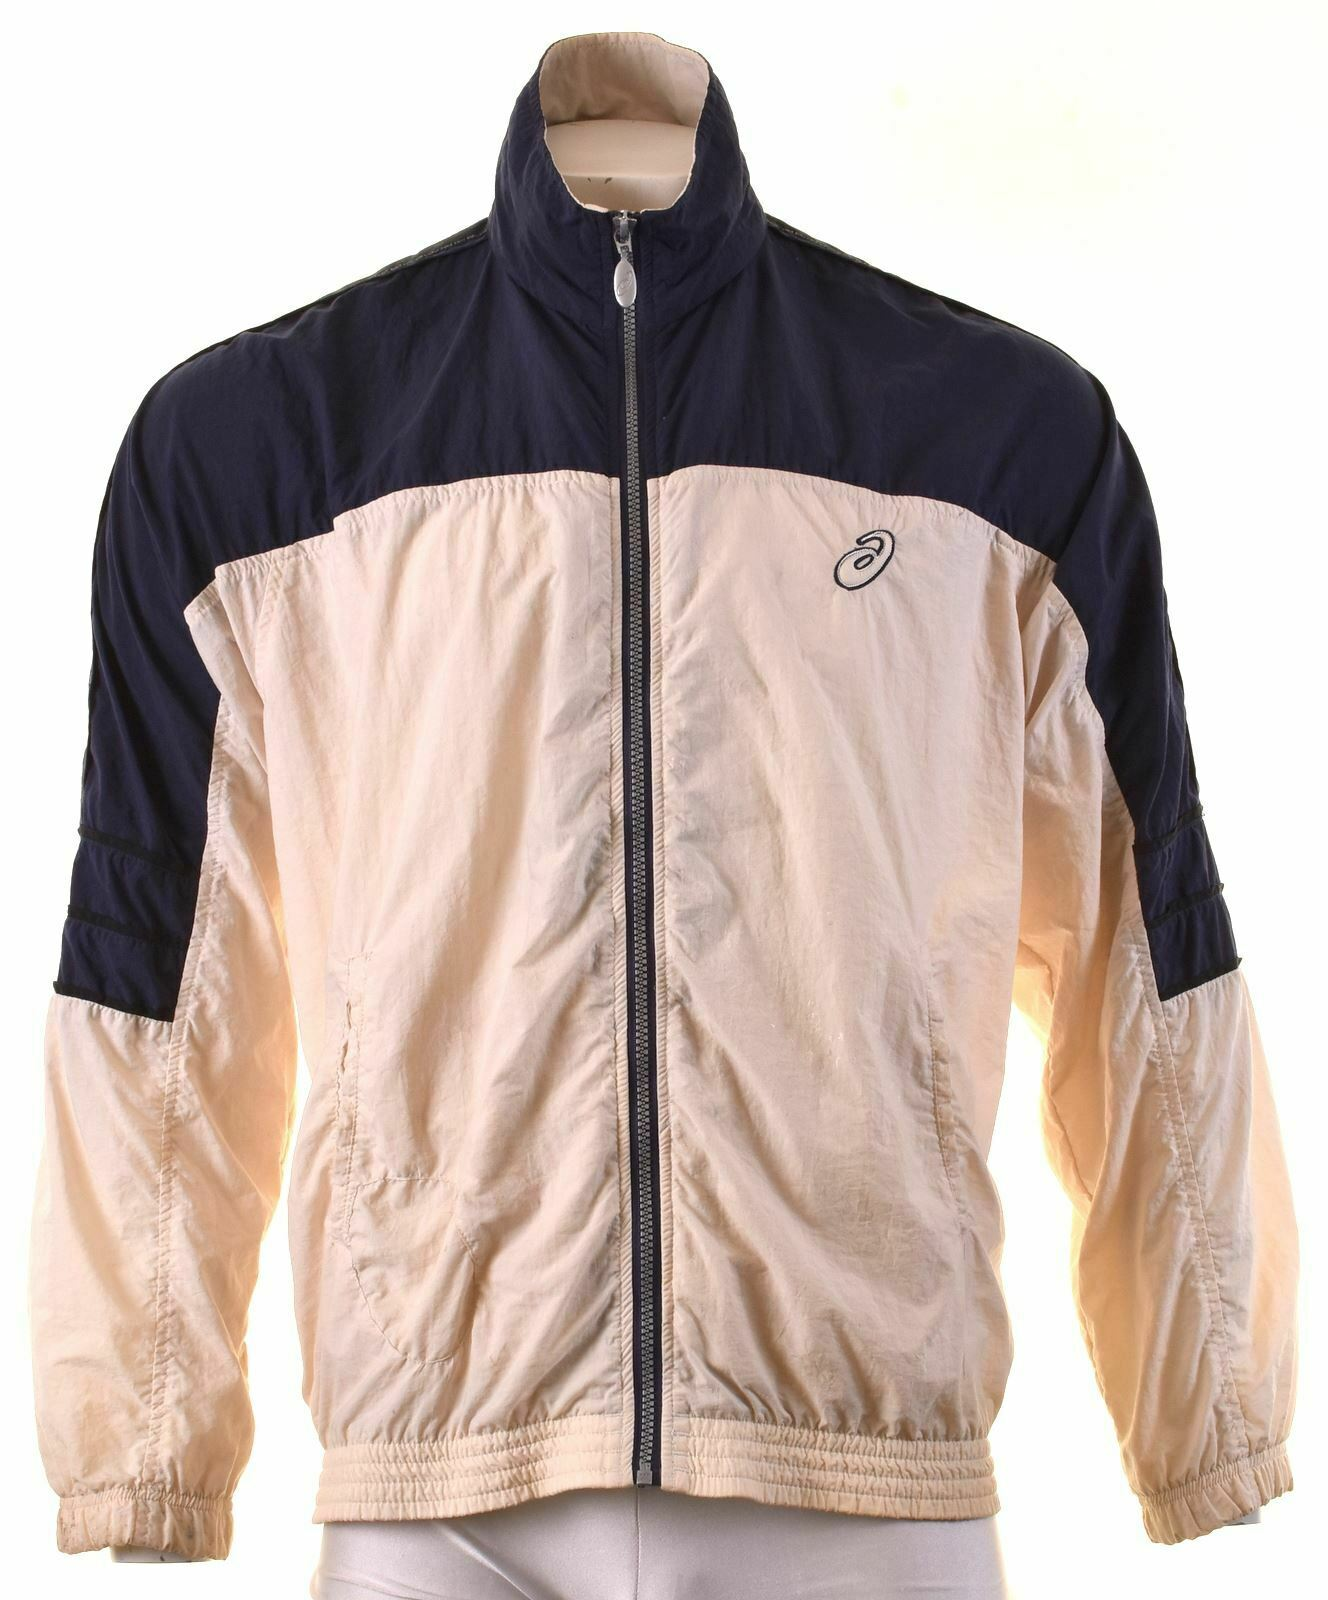 ASICS Mens Tracksuit Top Jacket Large Off White Polyamide KJ06